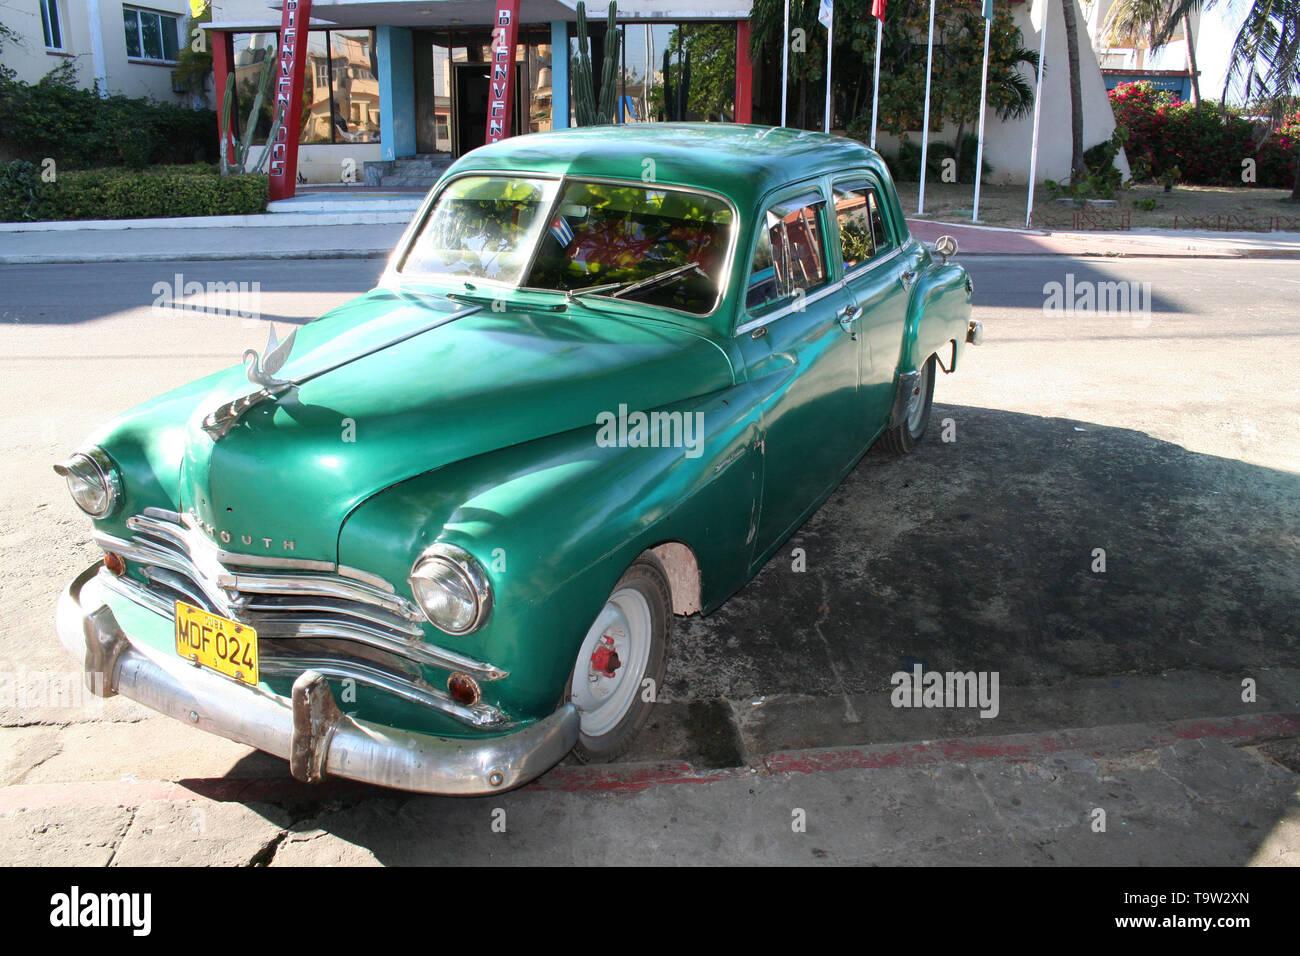 old car in Cuba - Stock Image